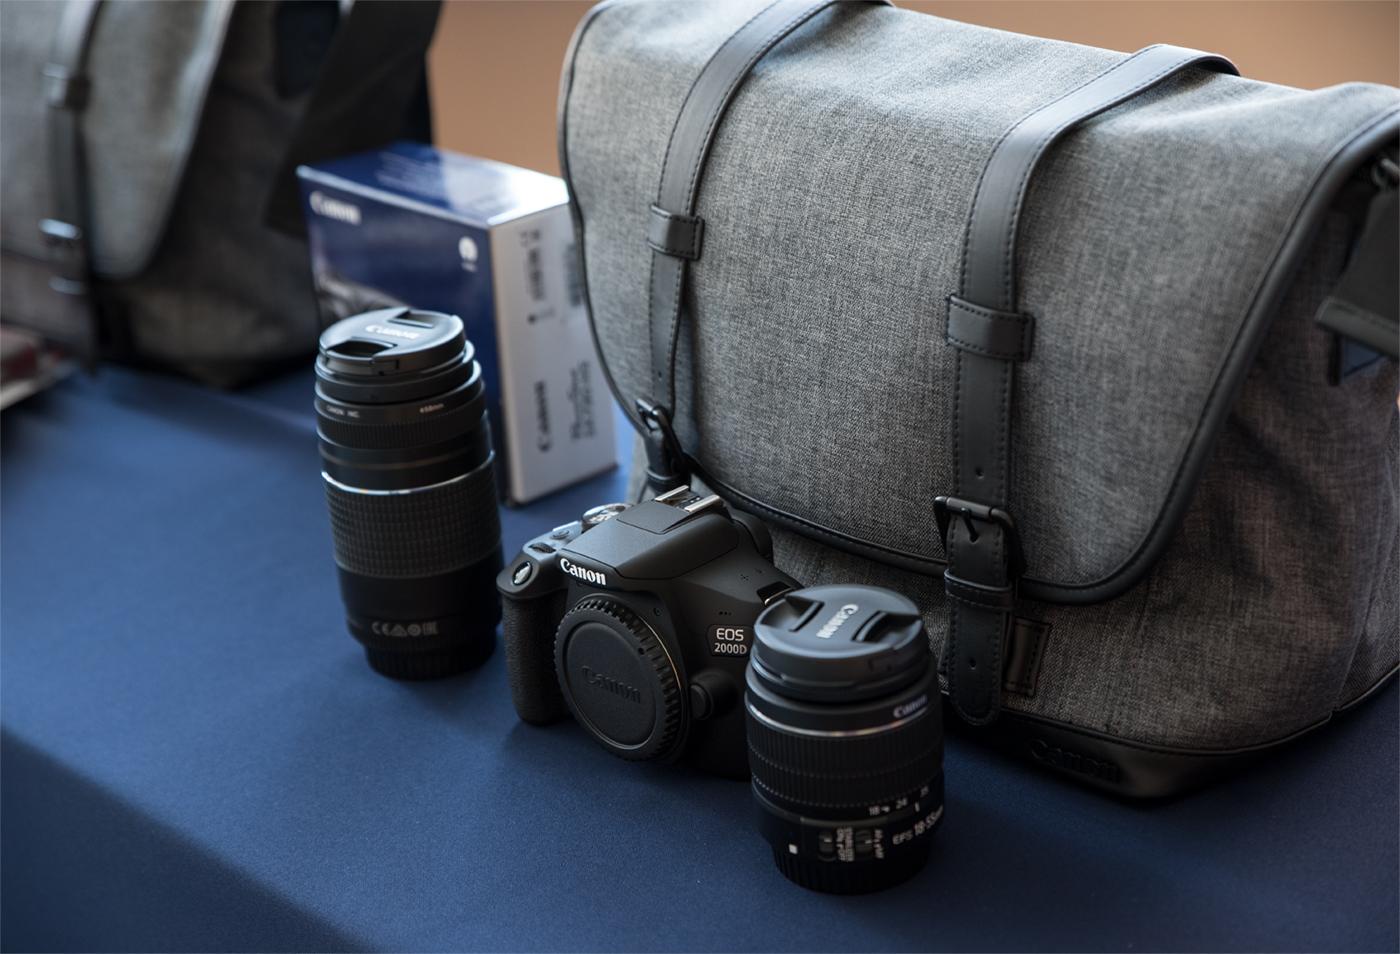 CyfroweAV projektory Canon kompleksowe rozwiązania AV